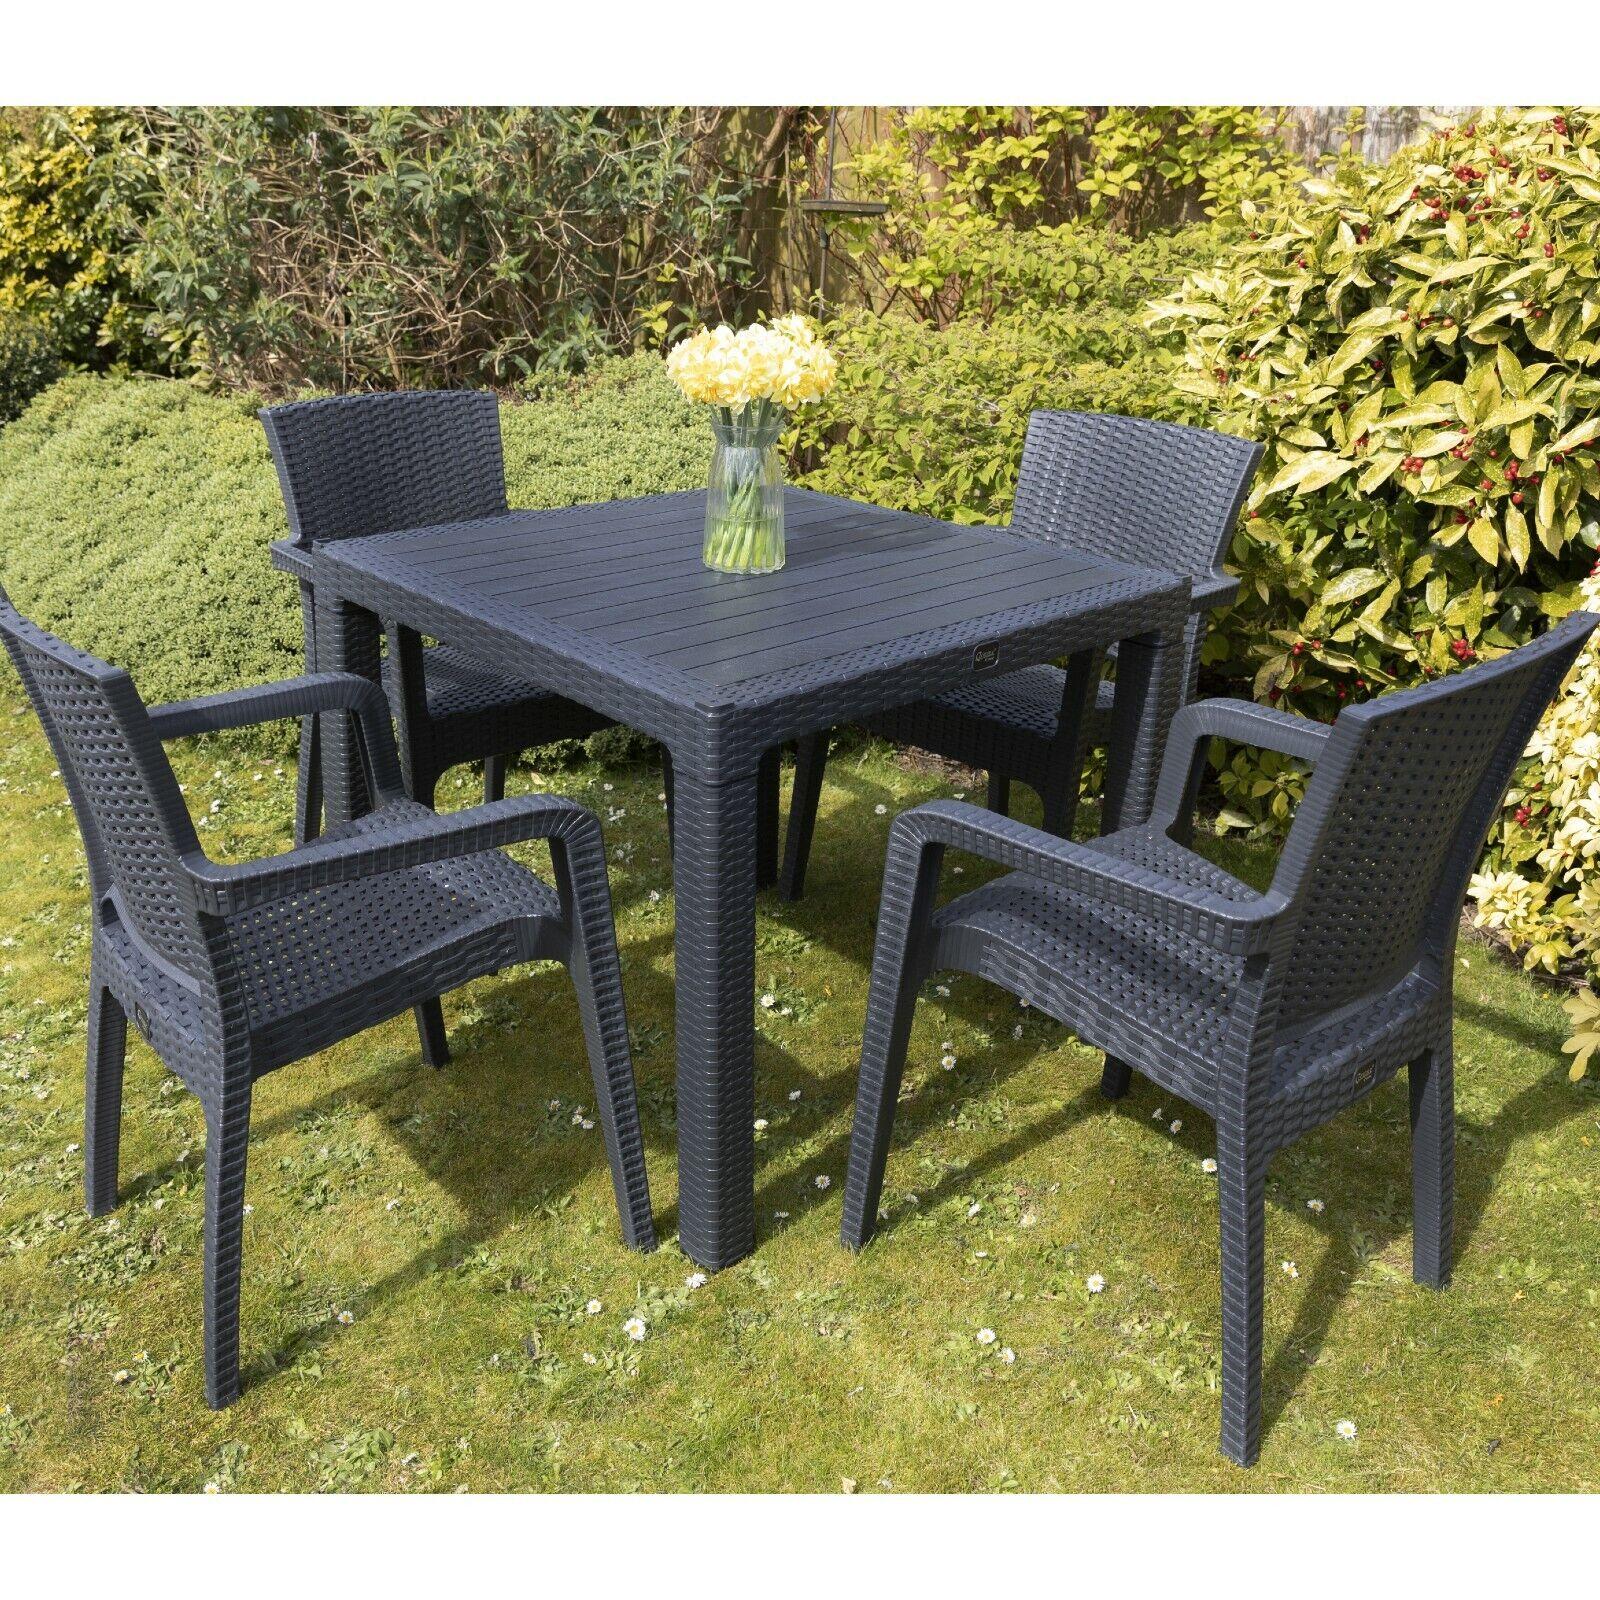 Garden Furniture - Garden Patio Furniture Set 4 Chairs Table Coffee Bistro Set Rattan Style Outdoor